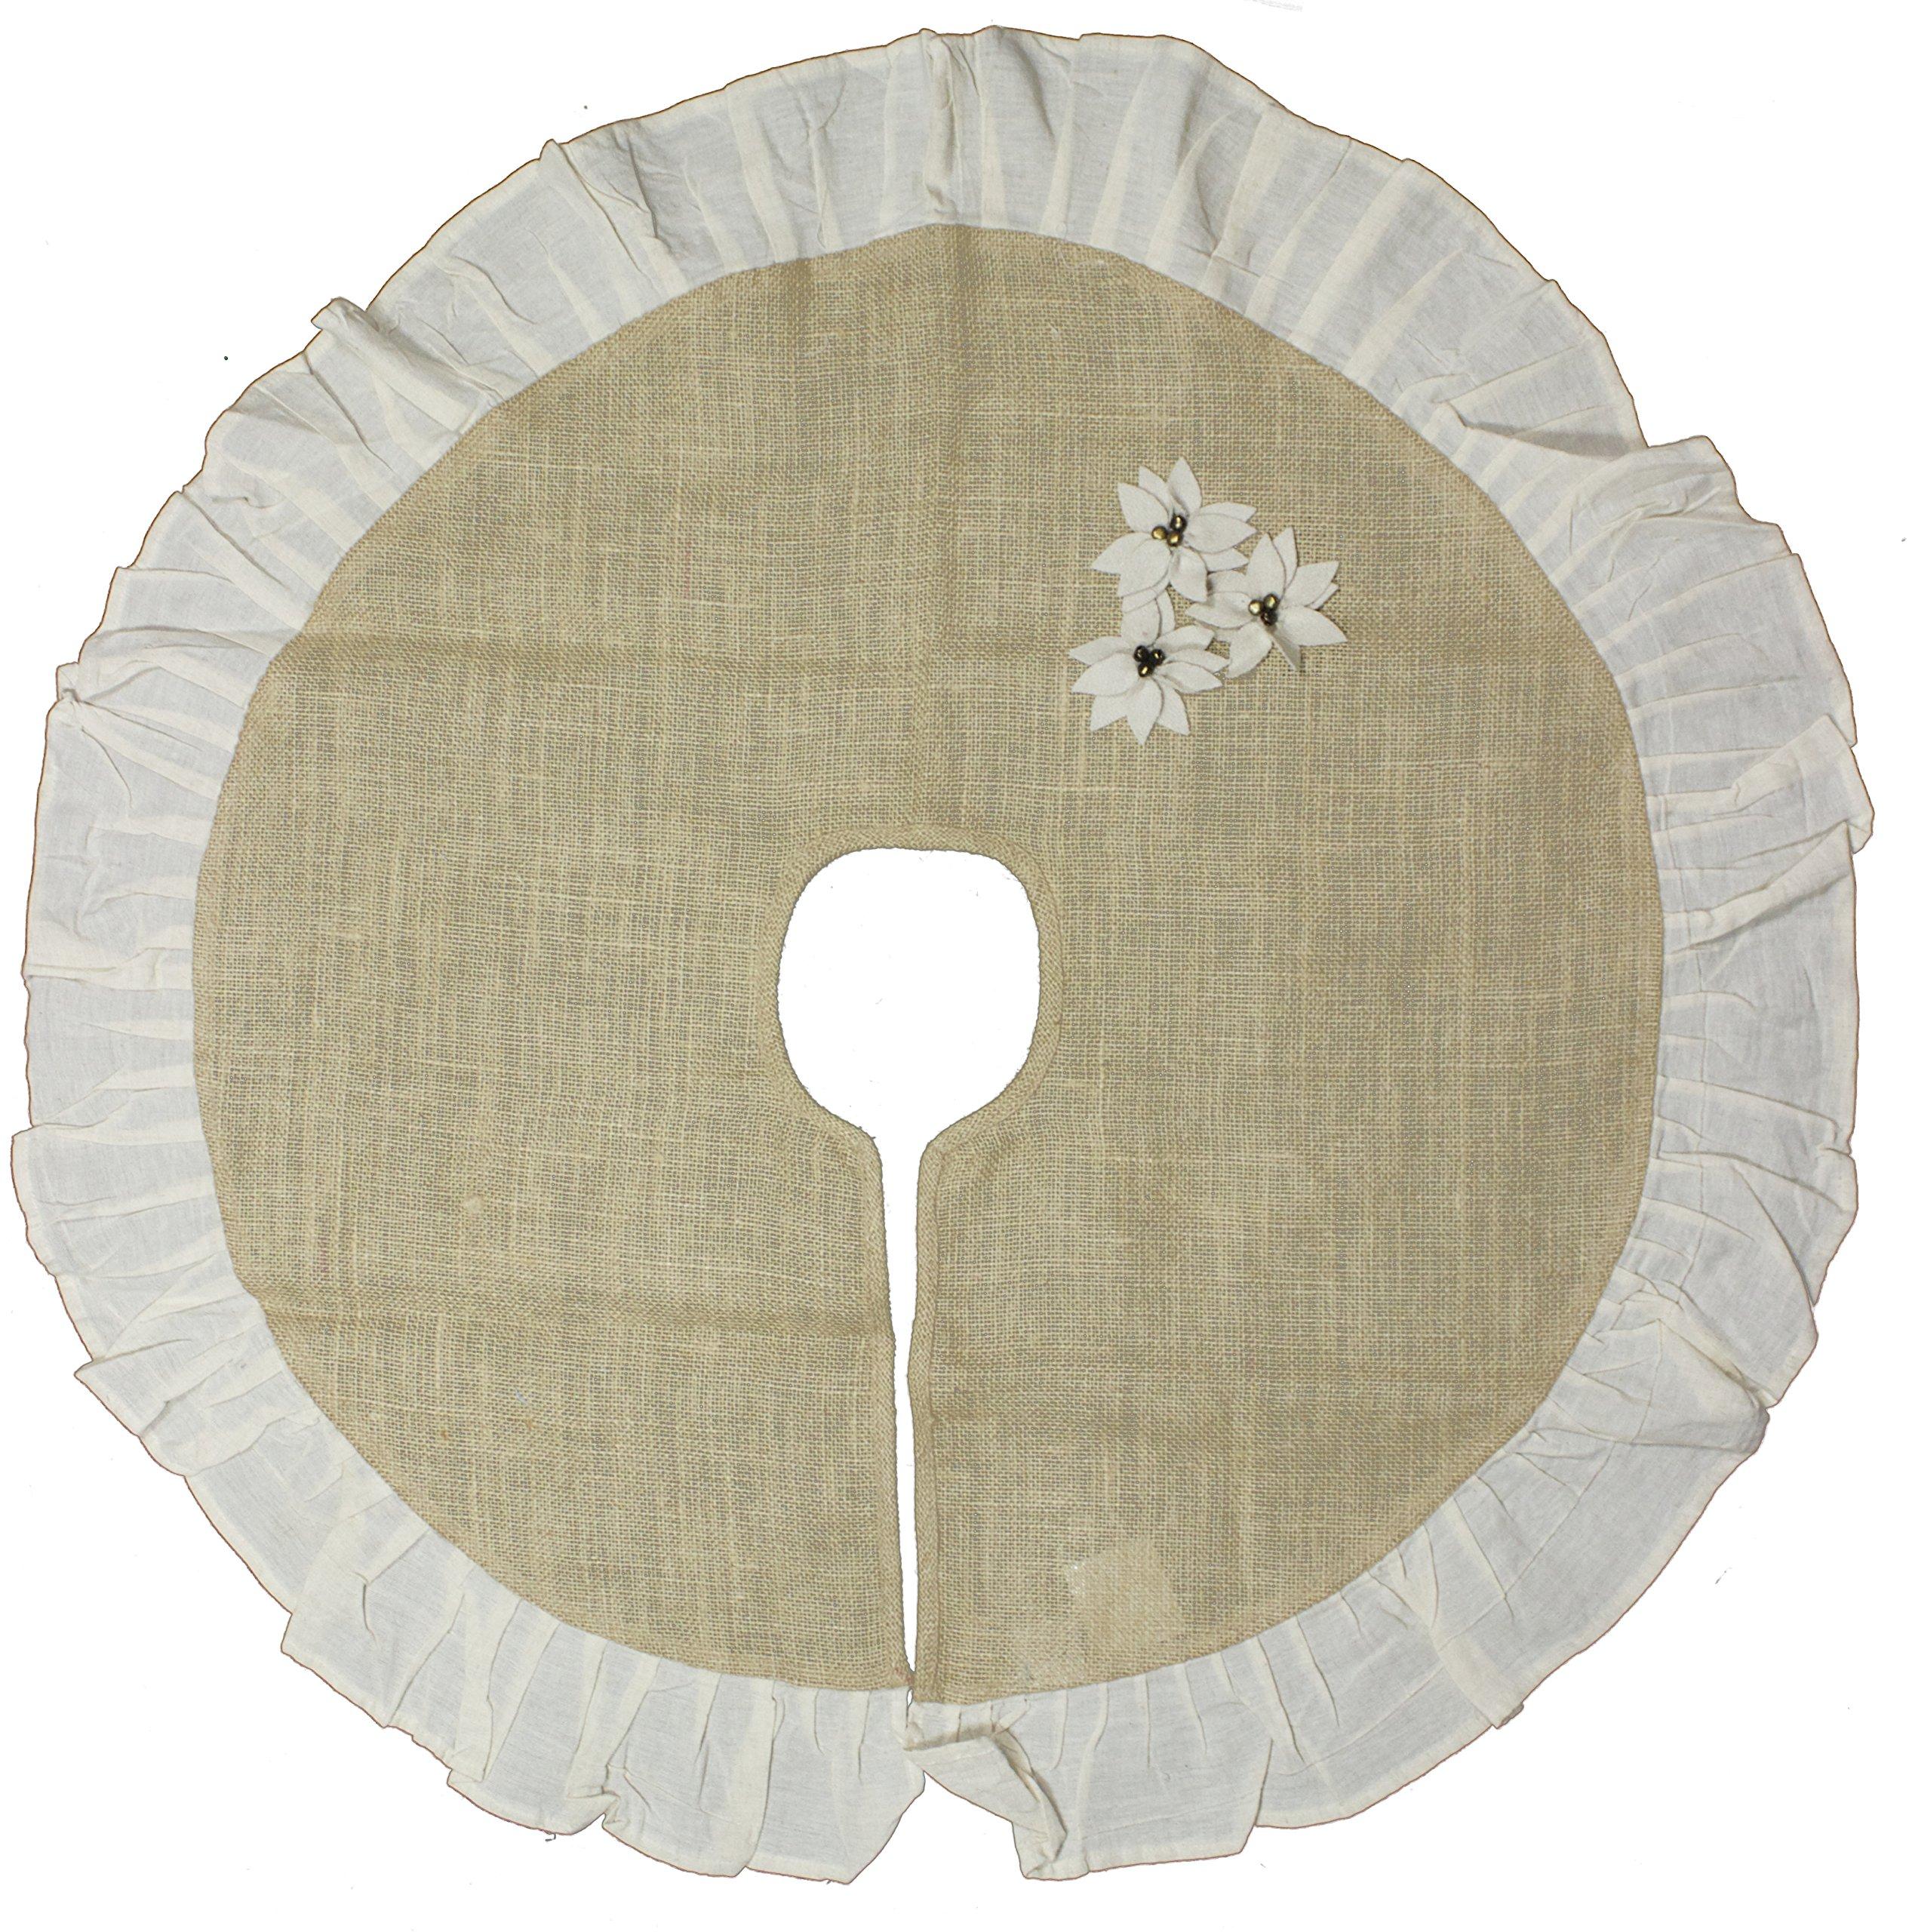 Burlap Poinsettia Tree Skirt w/Cream Ruffle (36'')